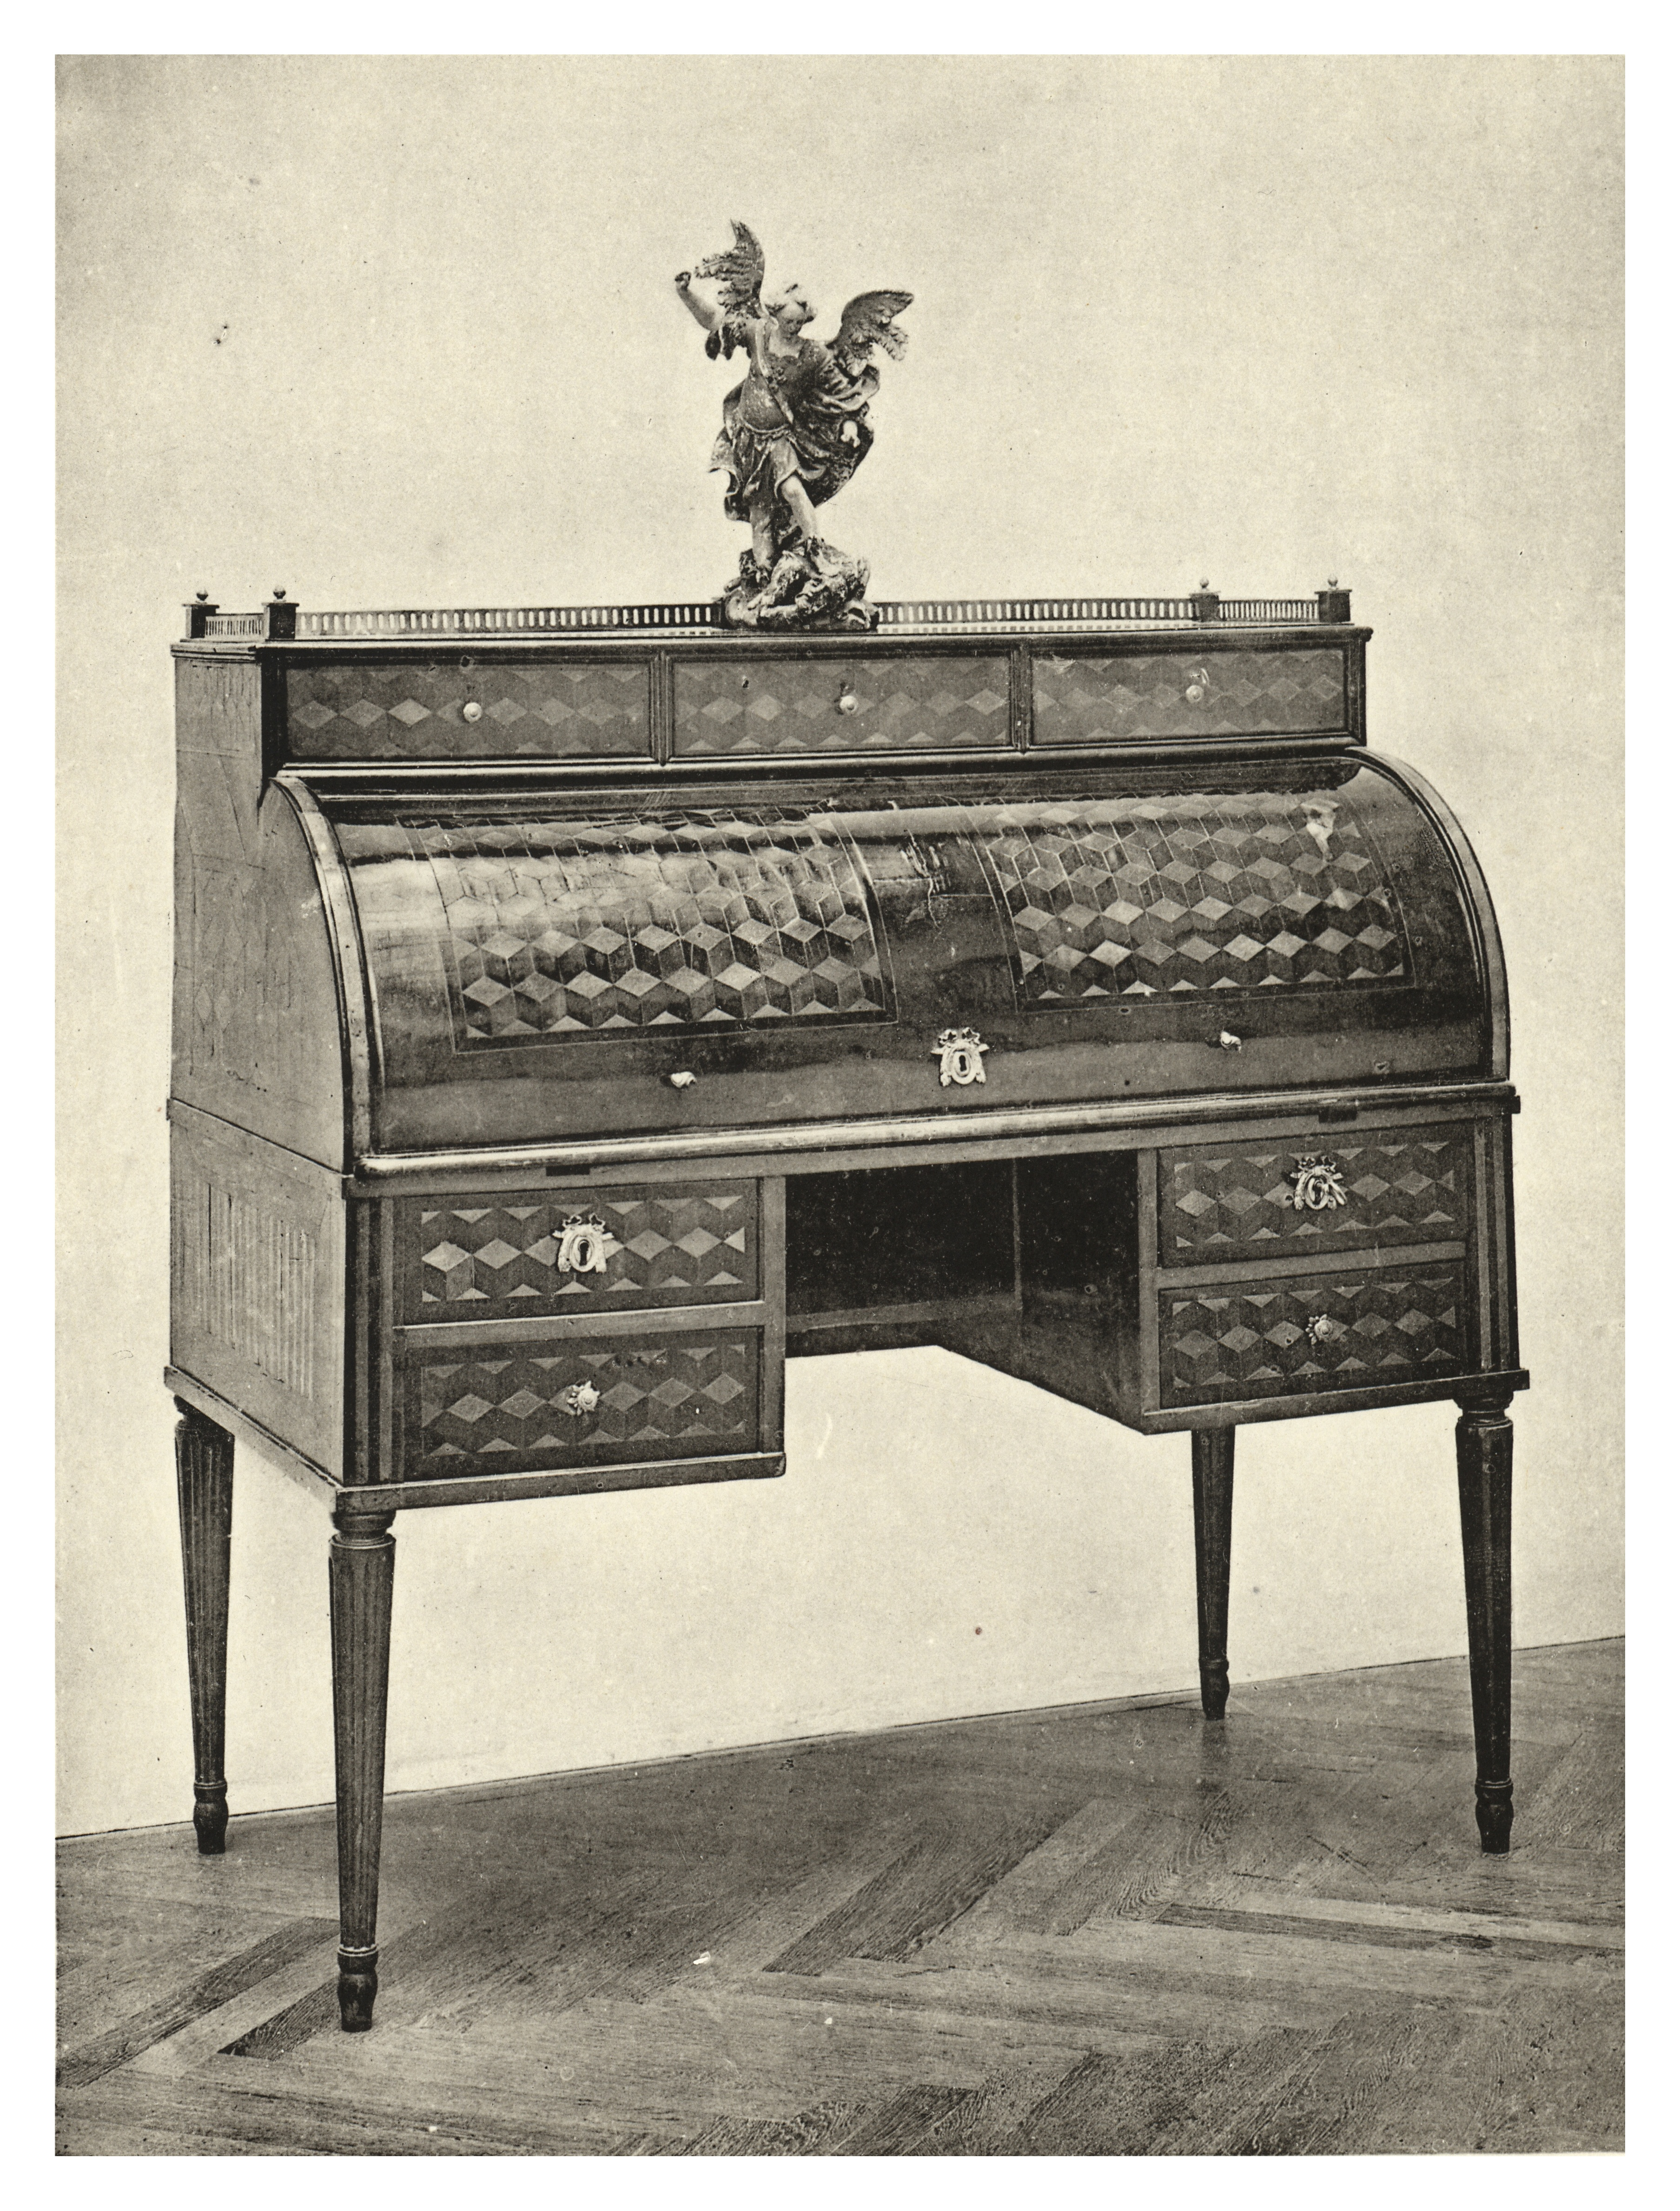 https://upload.wikimedia.org/wikipedia/commons/5/58/085_Josepinism_Style_Furniture.jpg